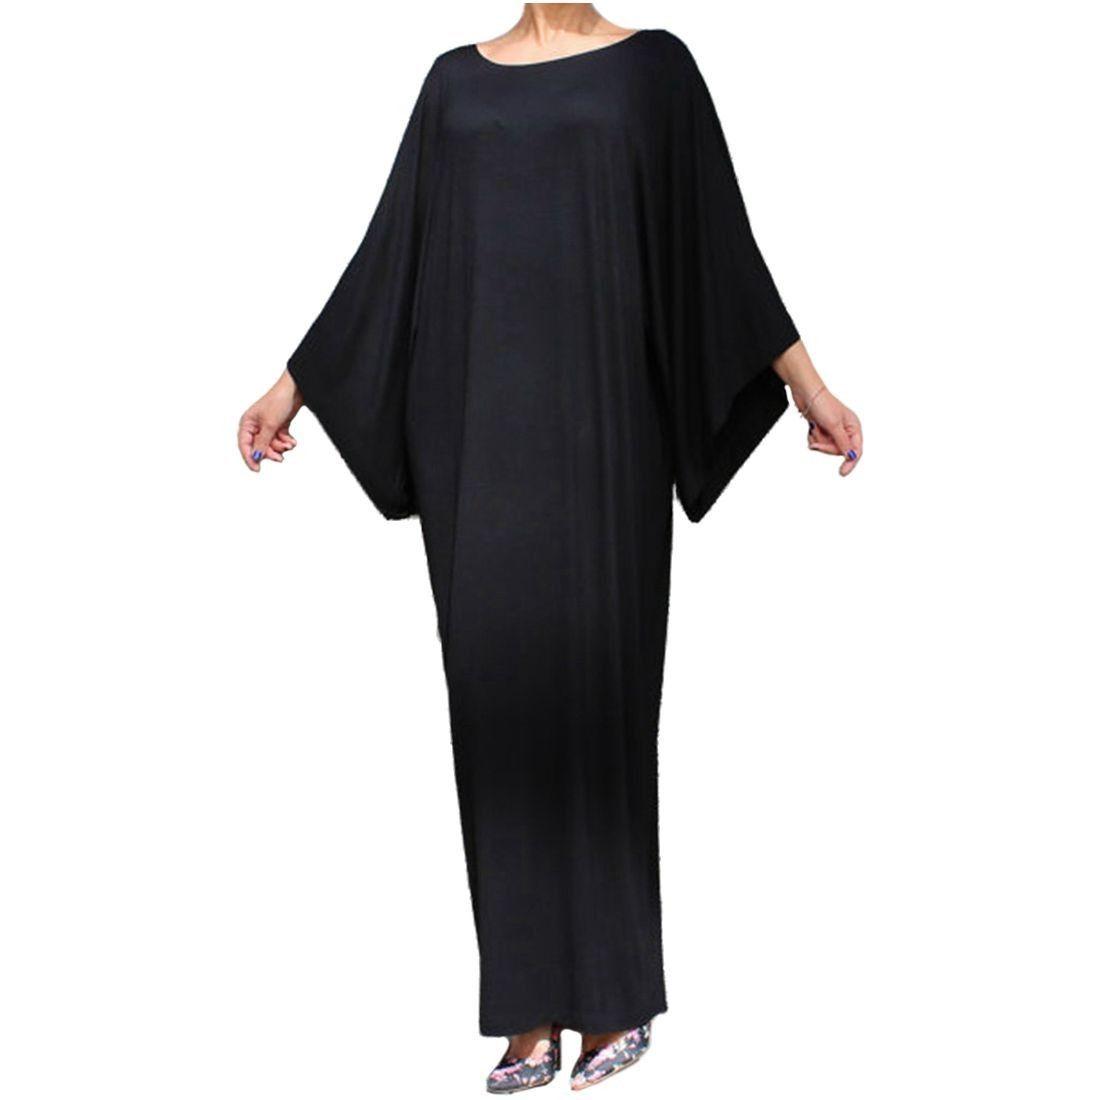 Women casual loose long dress ladies elegant batwing sleeve o